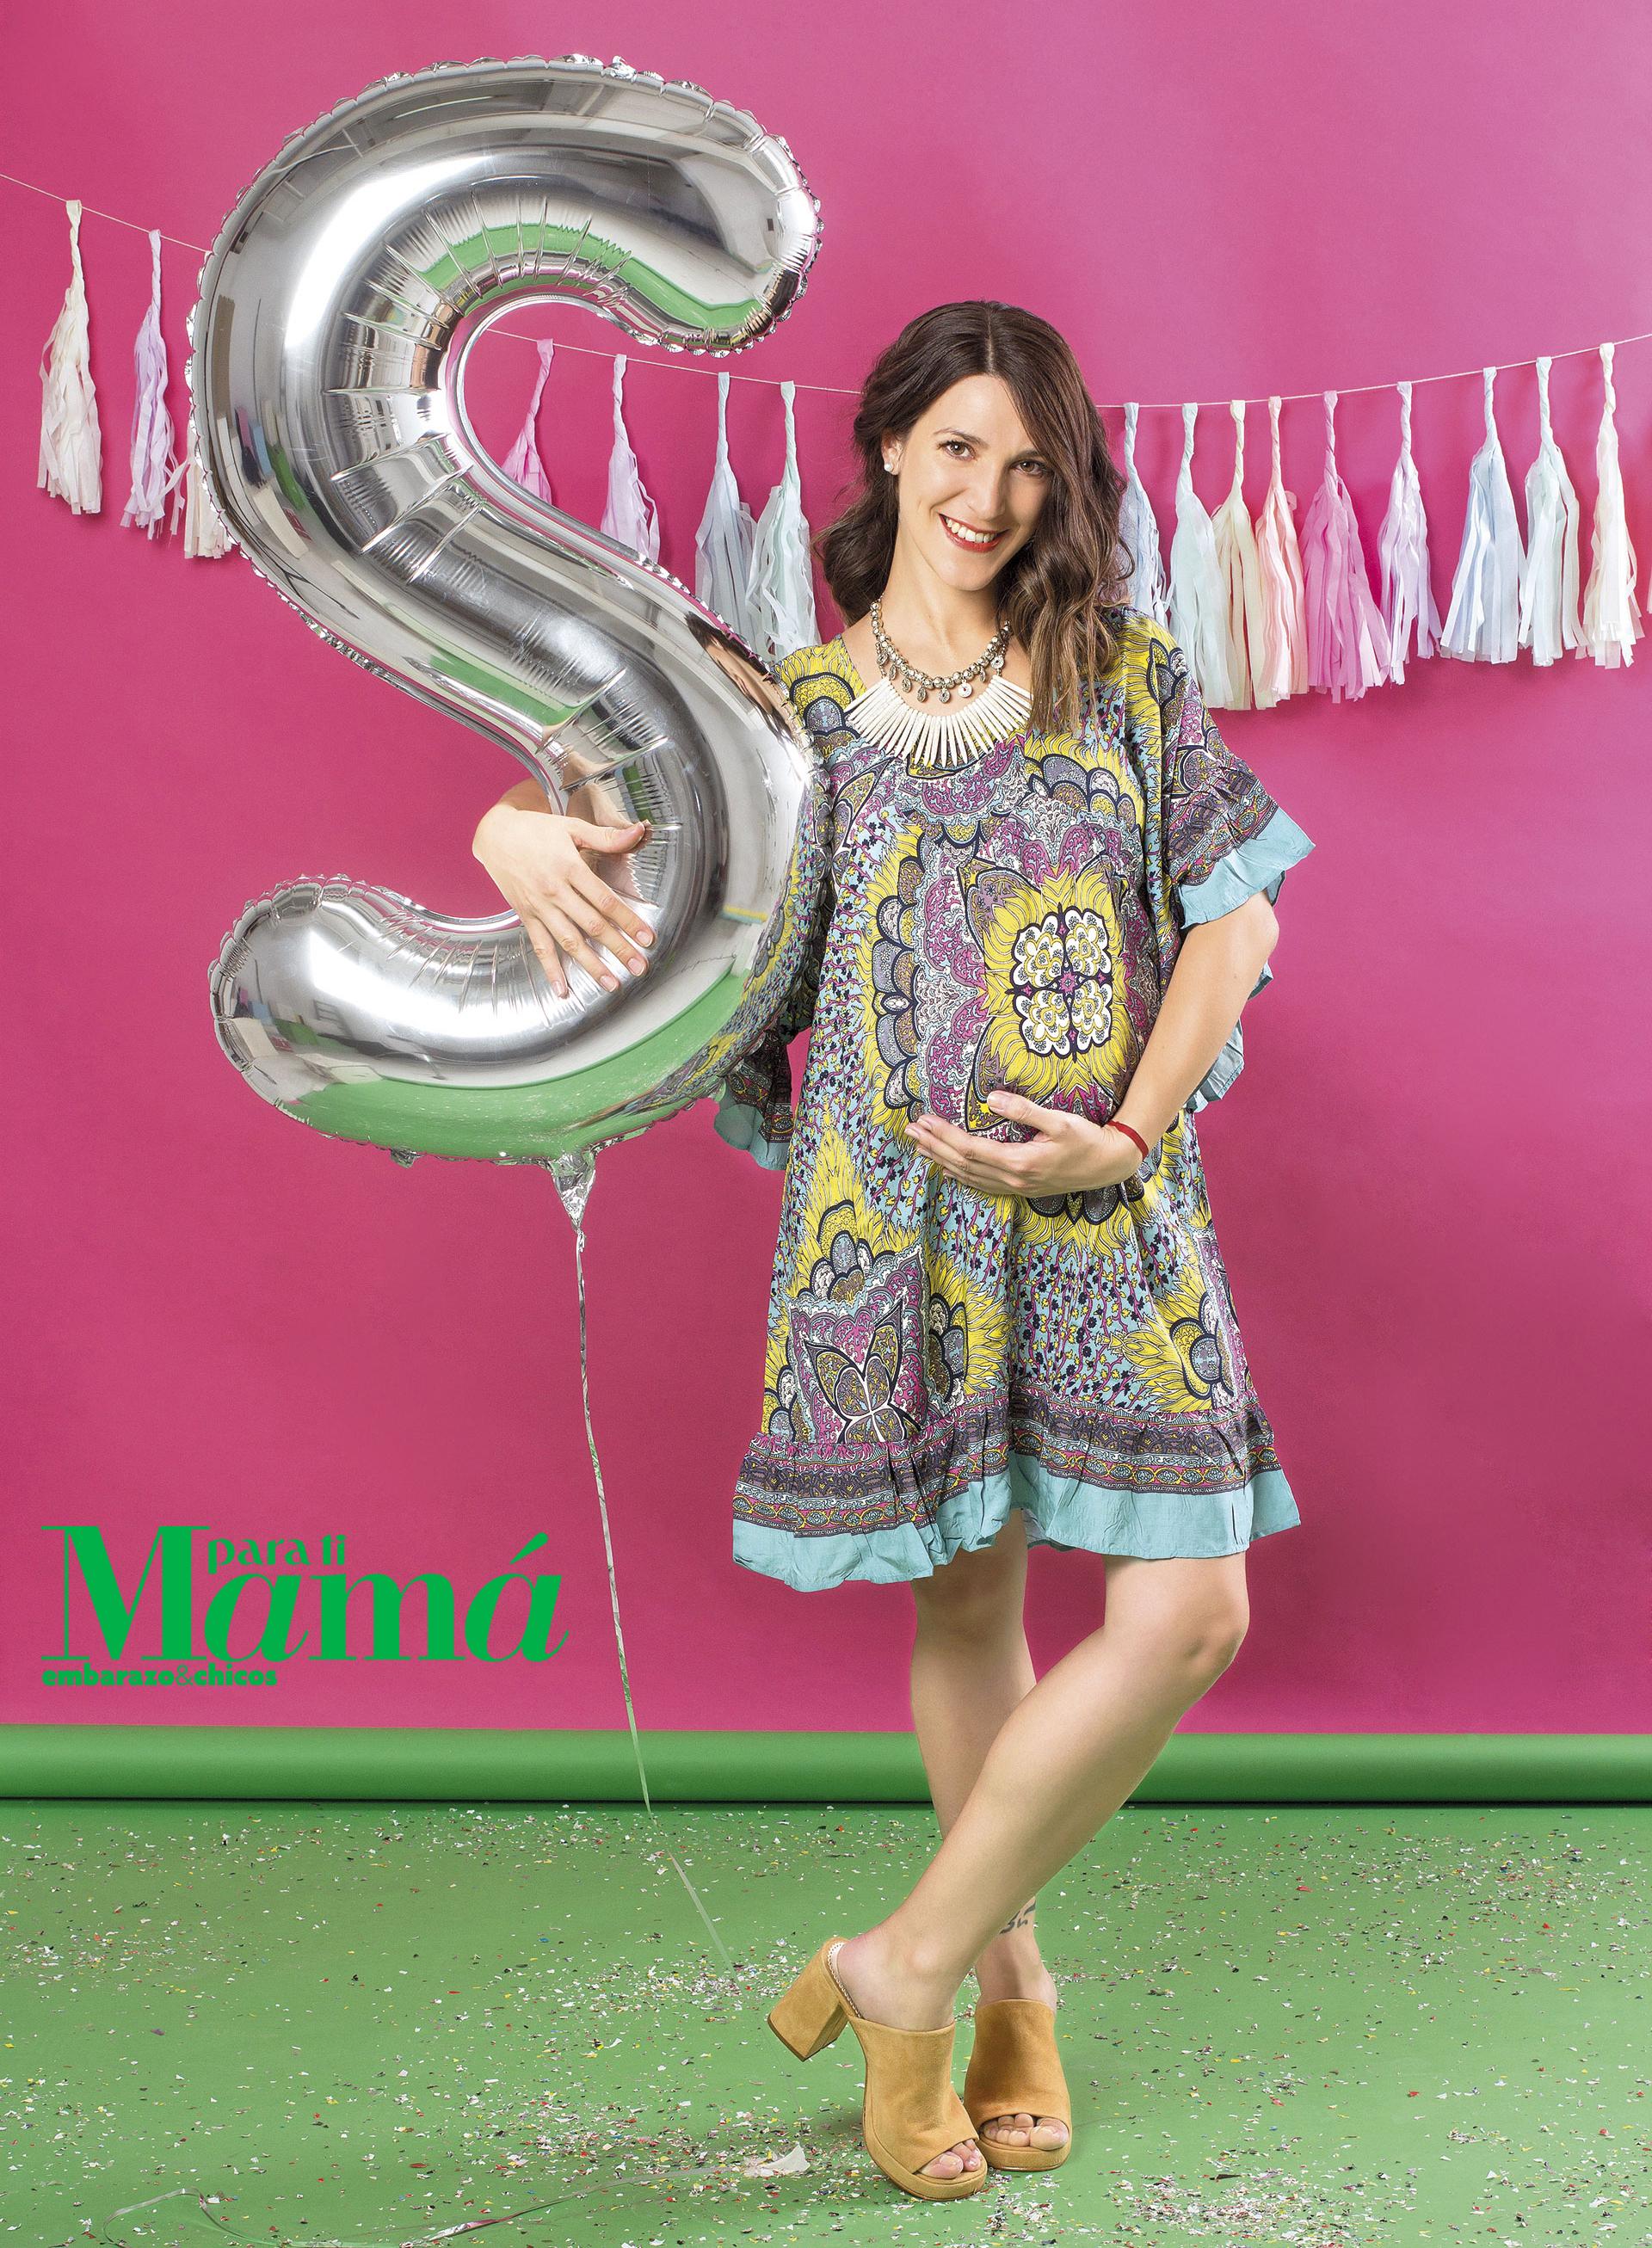 Vestidoestampado ycollar África($1.372 y $390),Maa Maternity; zuecos degamuza ($2.888),Sofi Martiré.